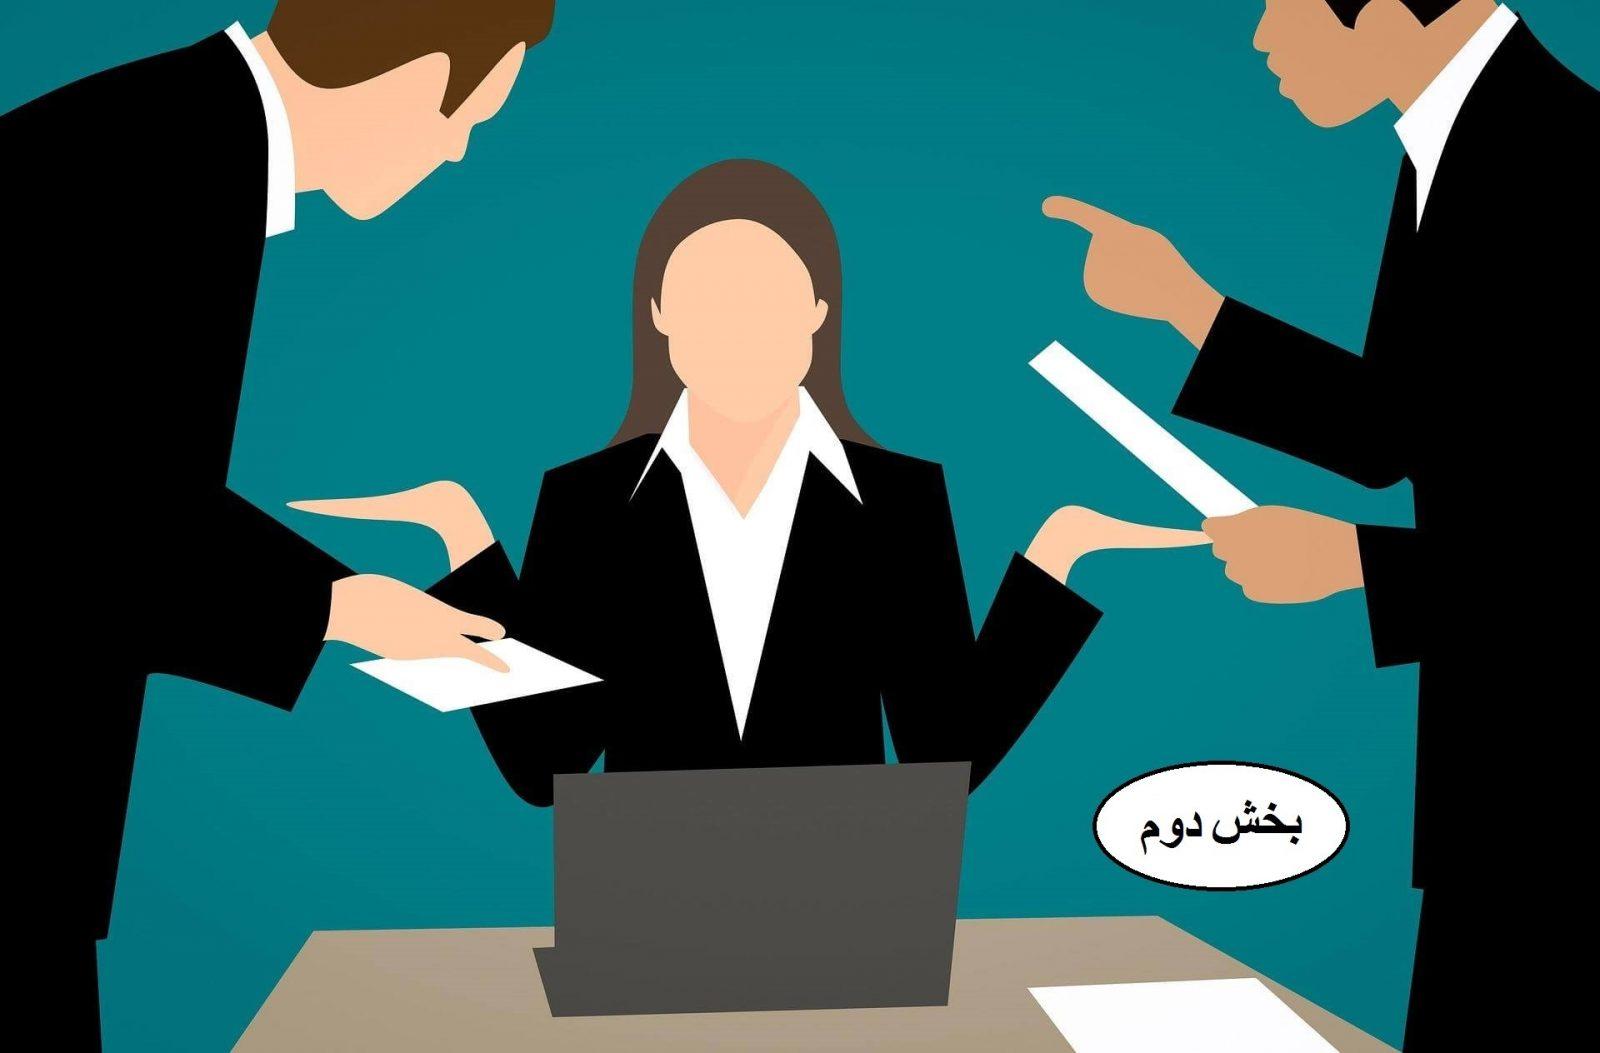 مدیریت تعارض (Conflict management) – بخش دوم